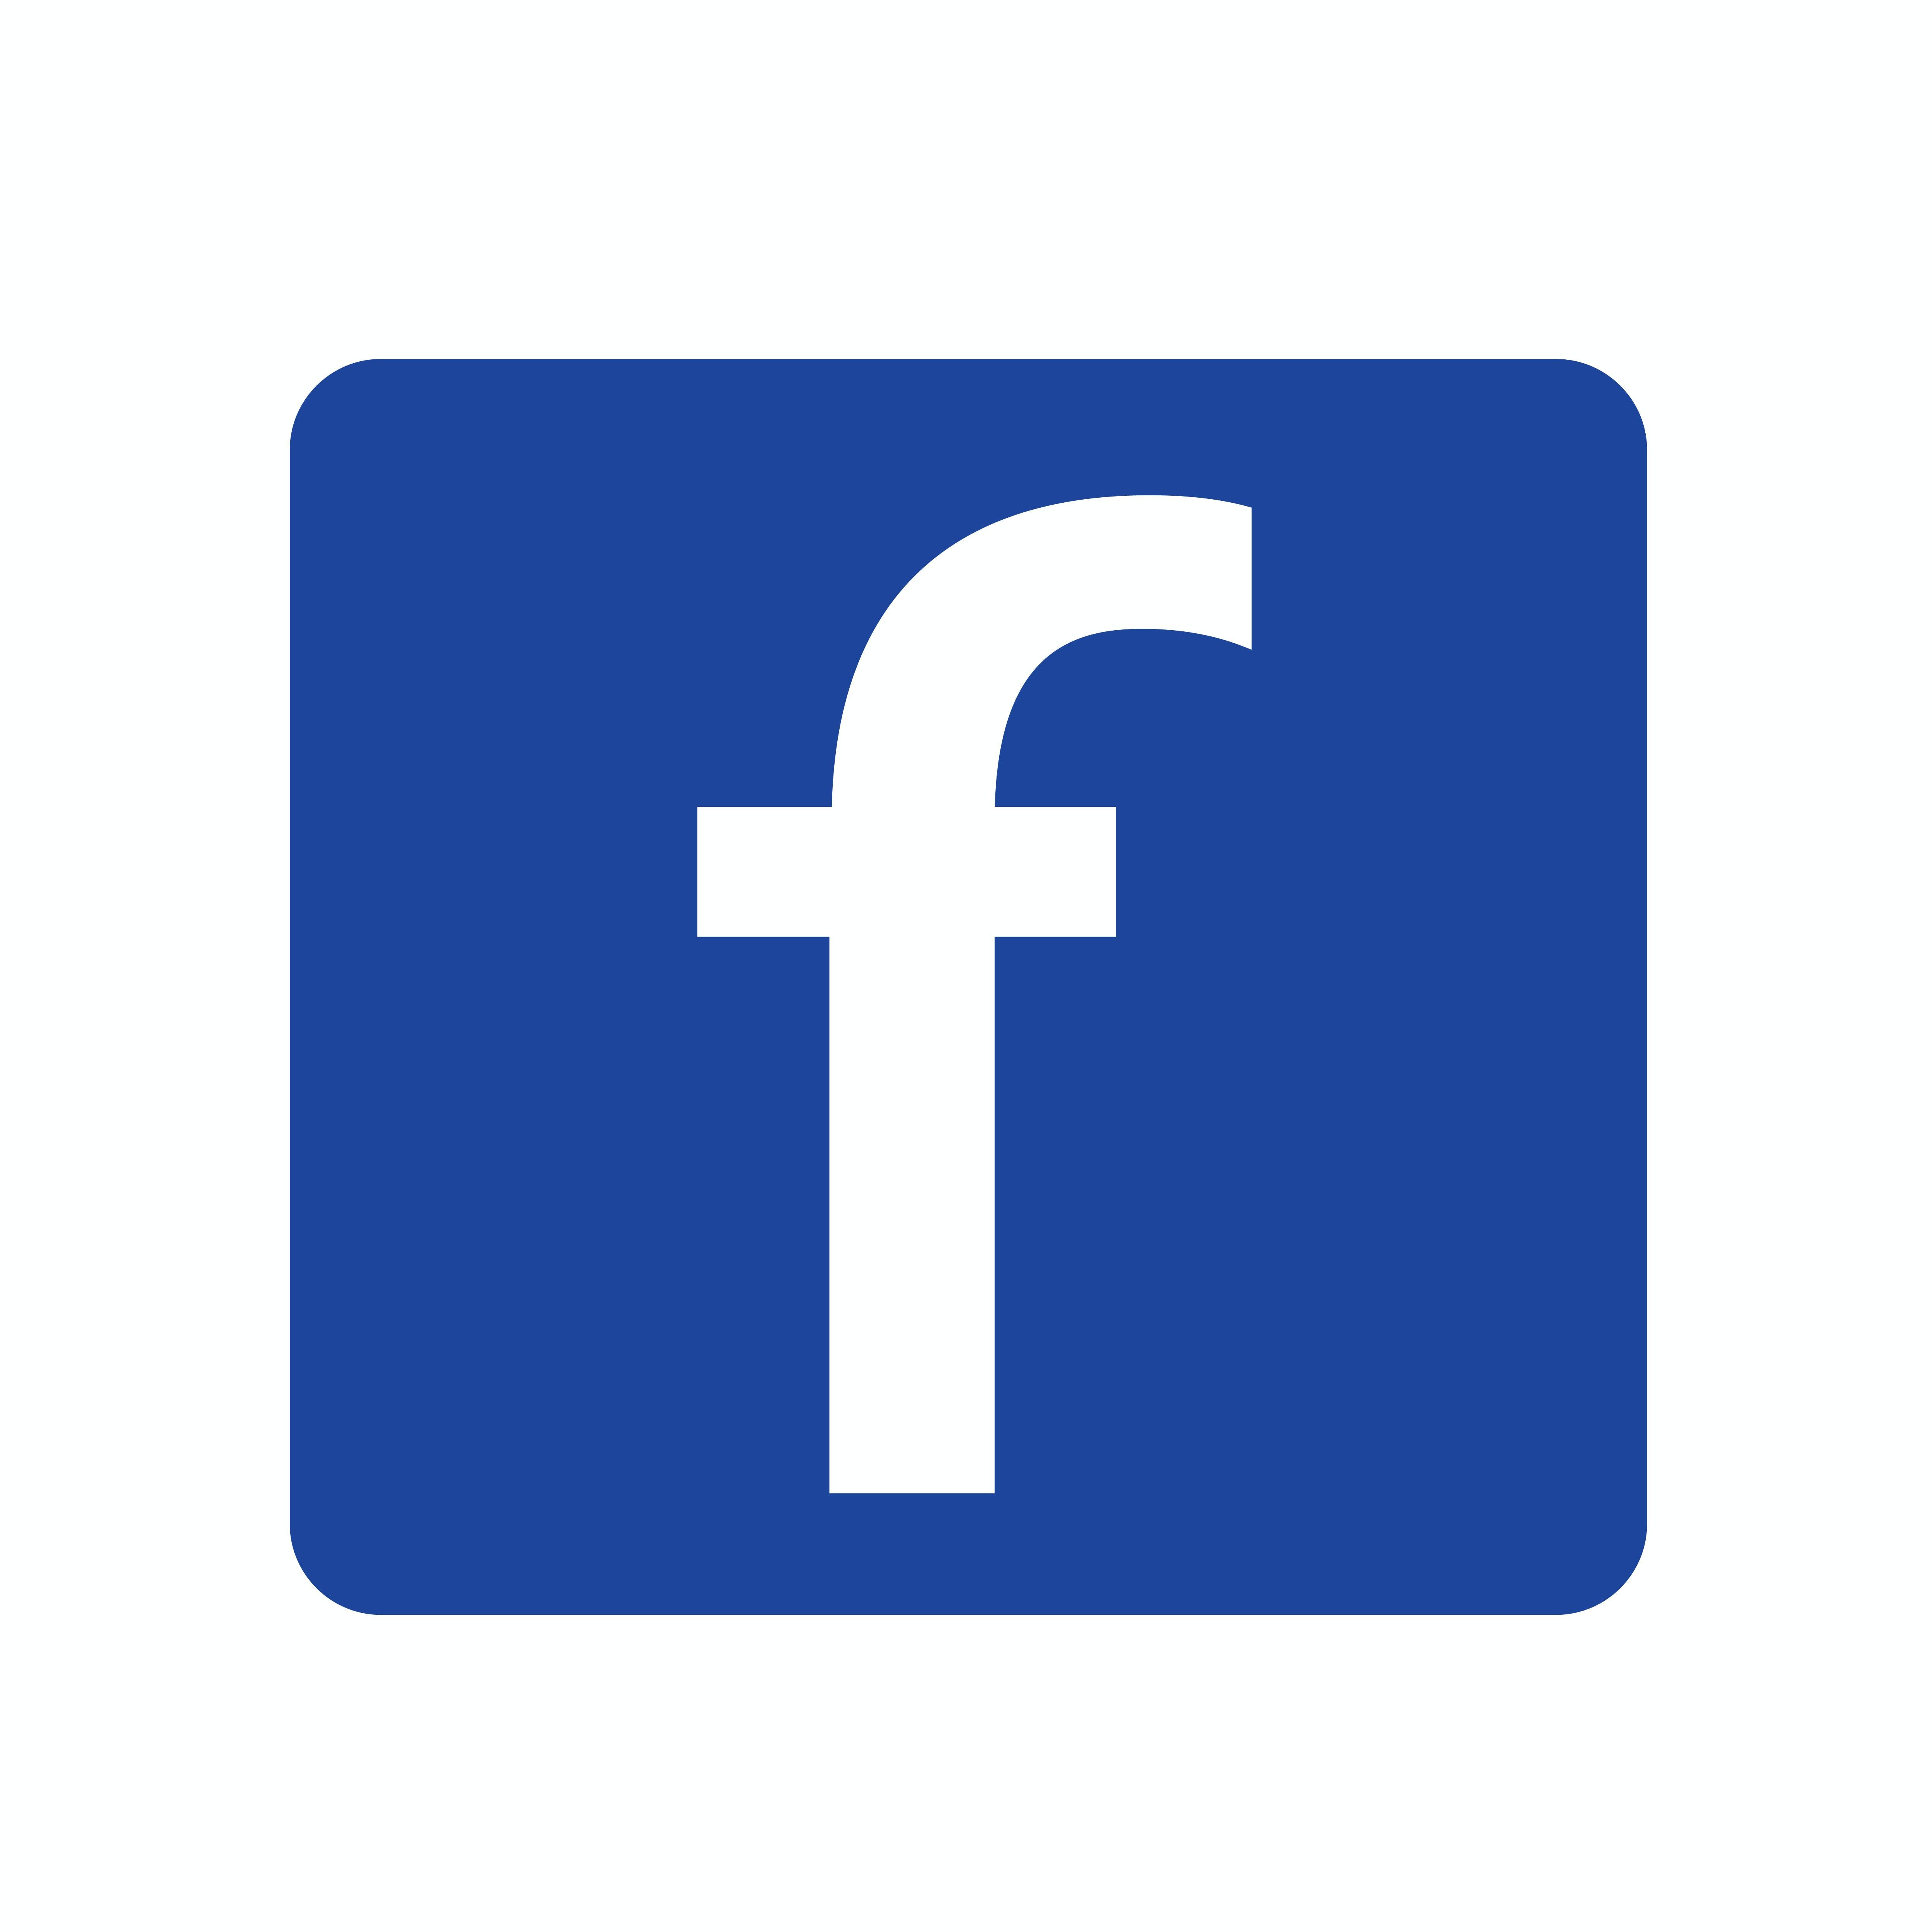 Free stock photo of marketing, follow, creative, blue